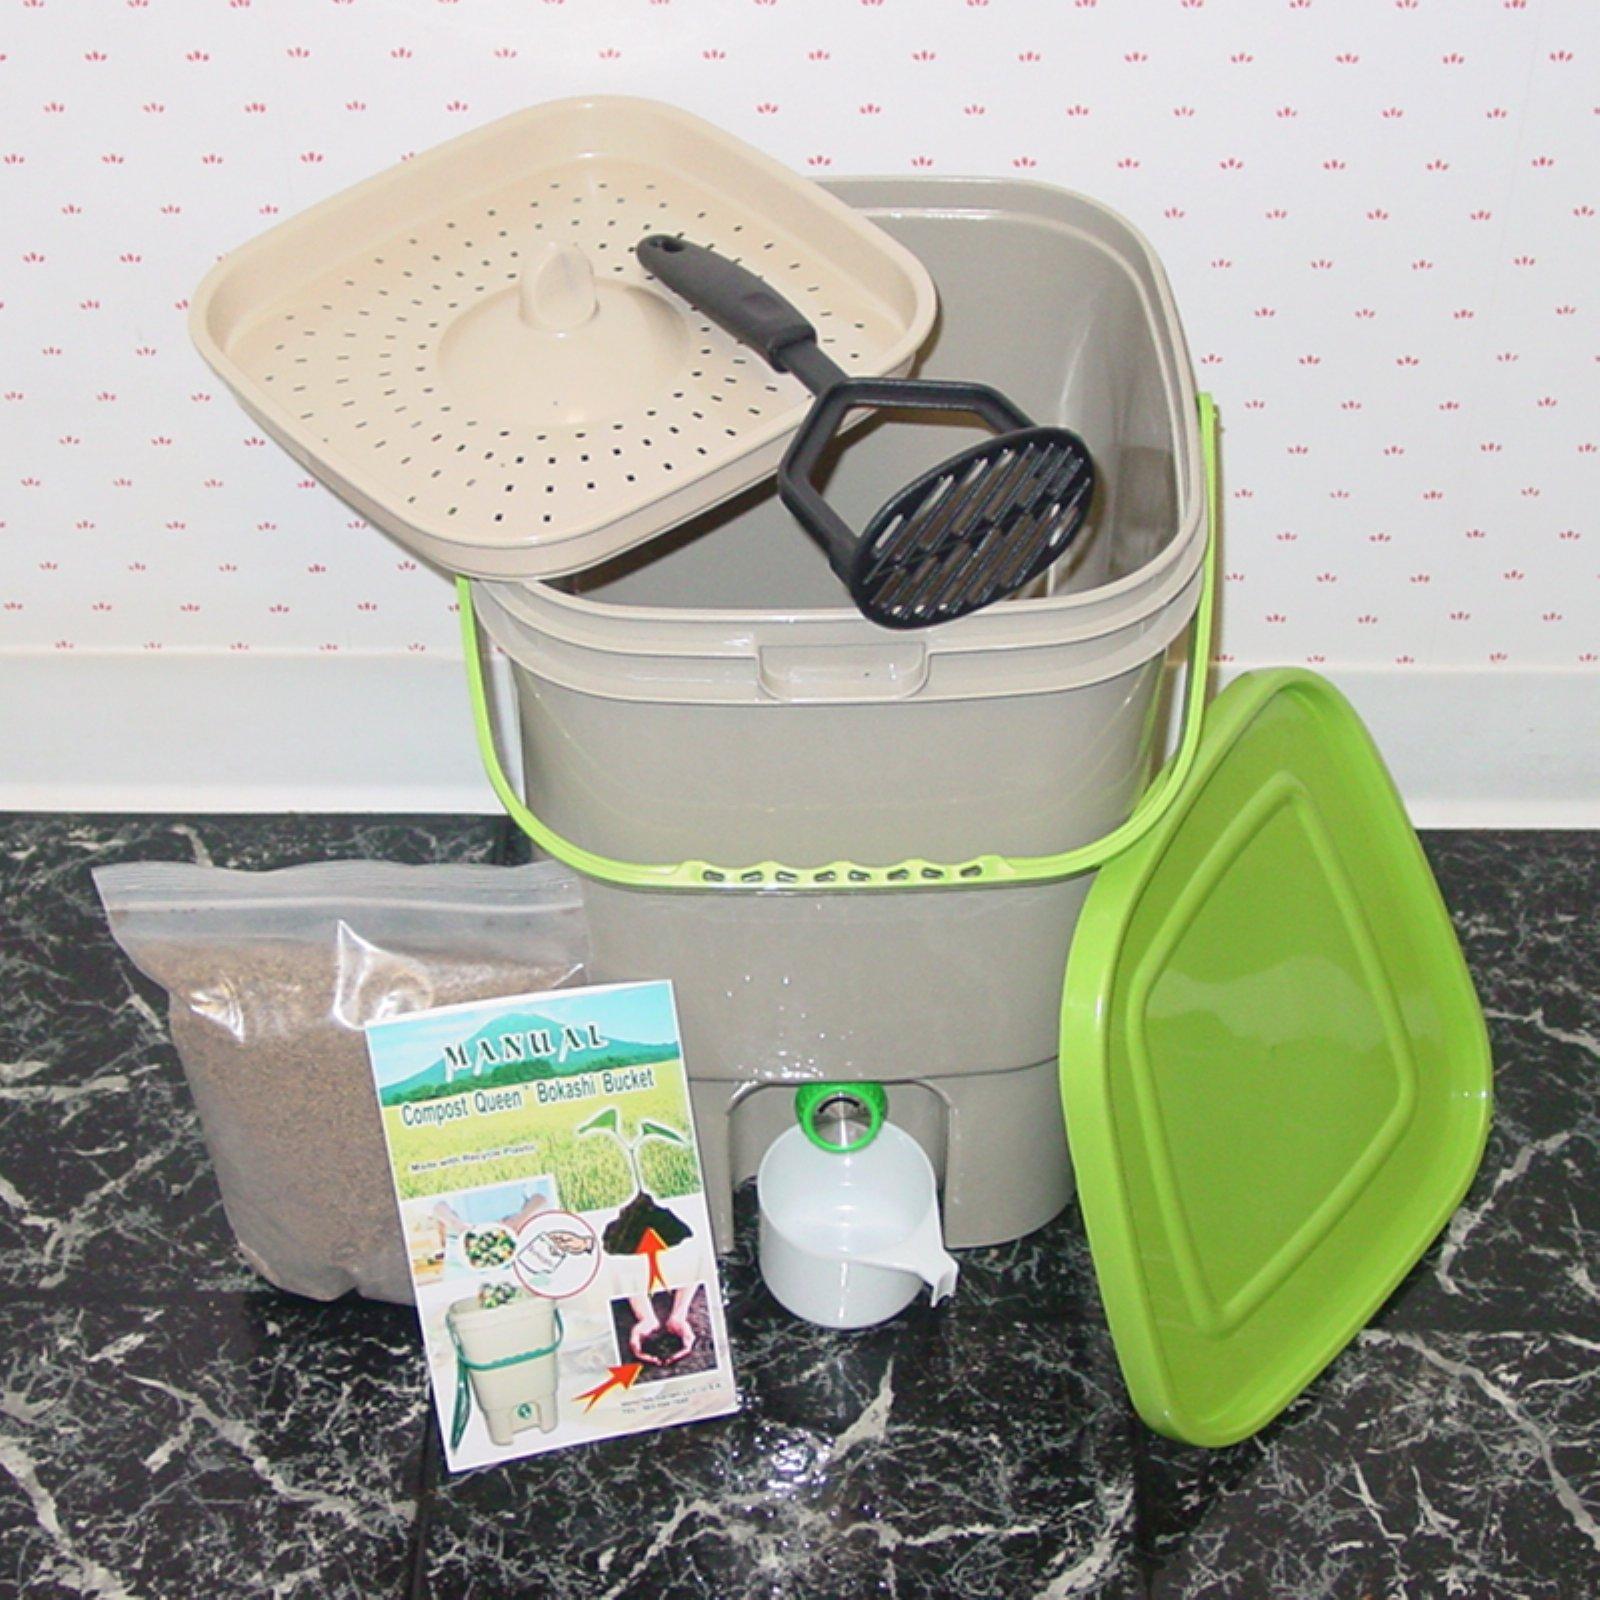 Vermitek Bokashi Compost Kit by Green Life LLC